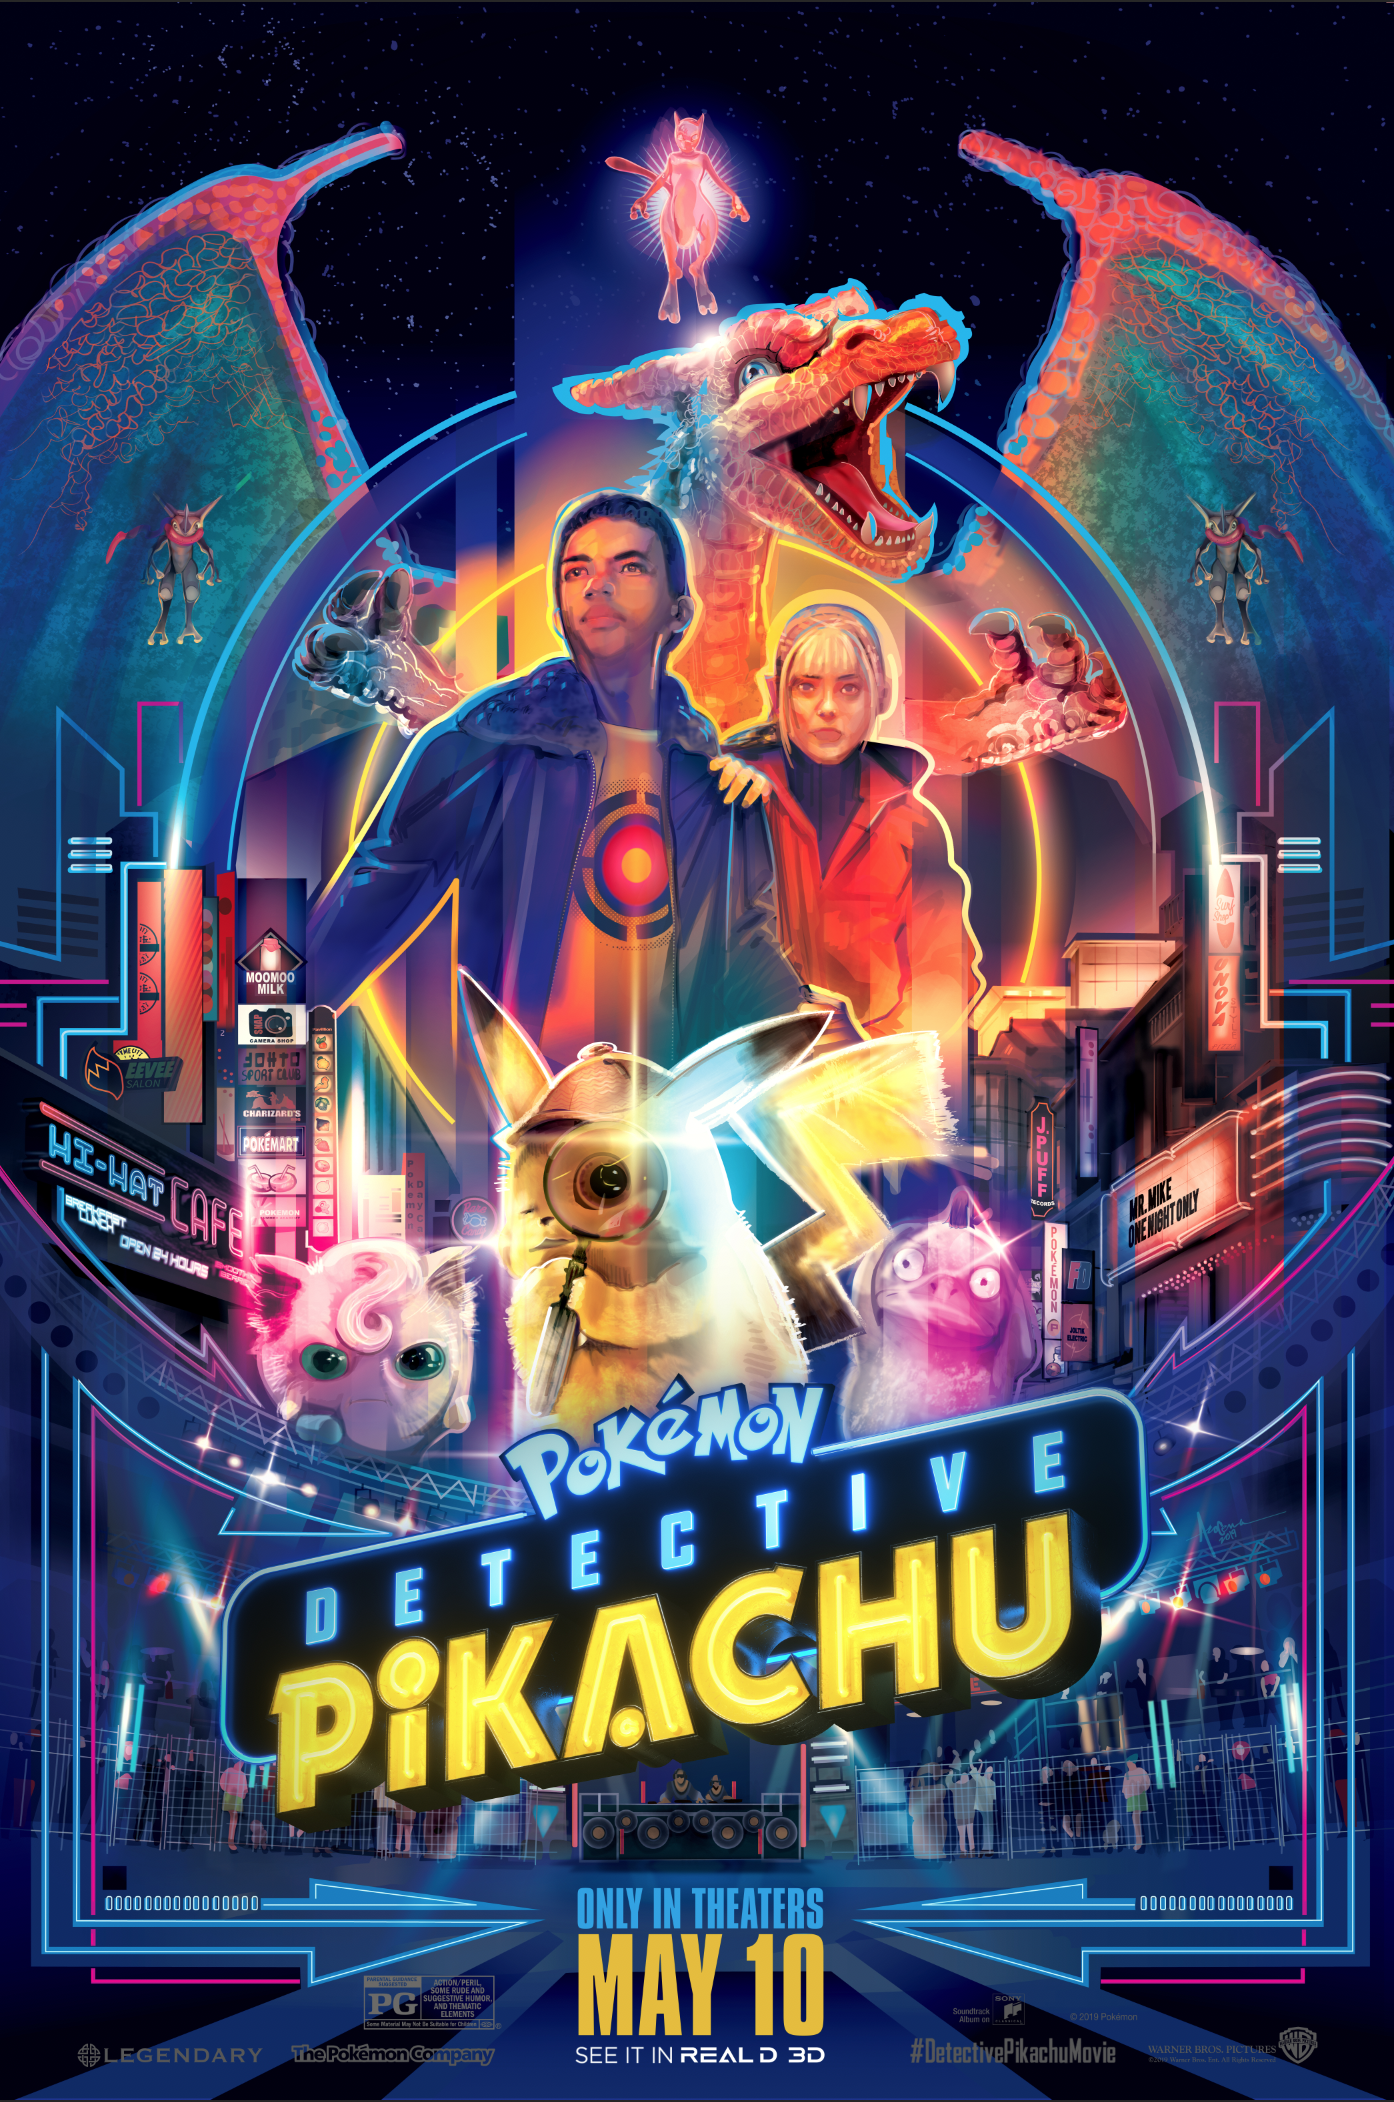 Detective Pikachu Poster Posse Cartazes De Filmes Cartaz Filmes